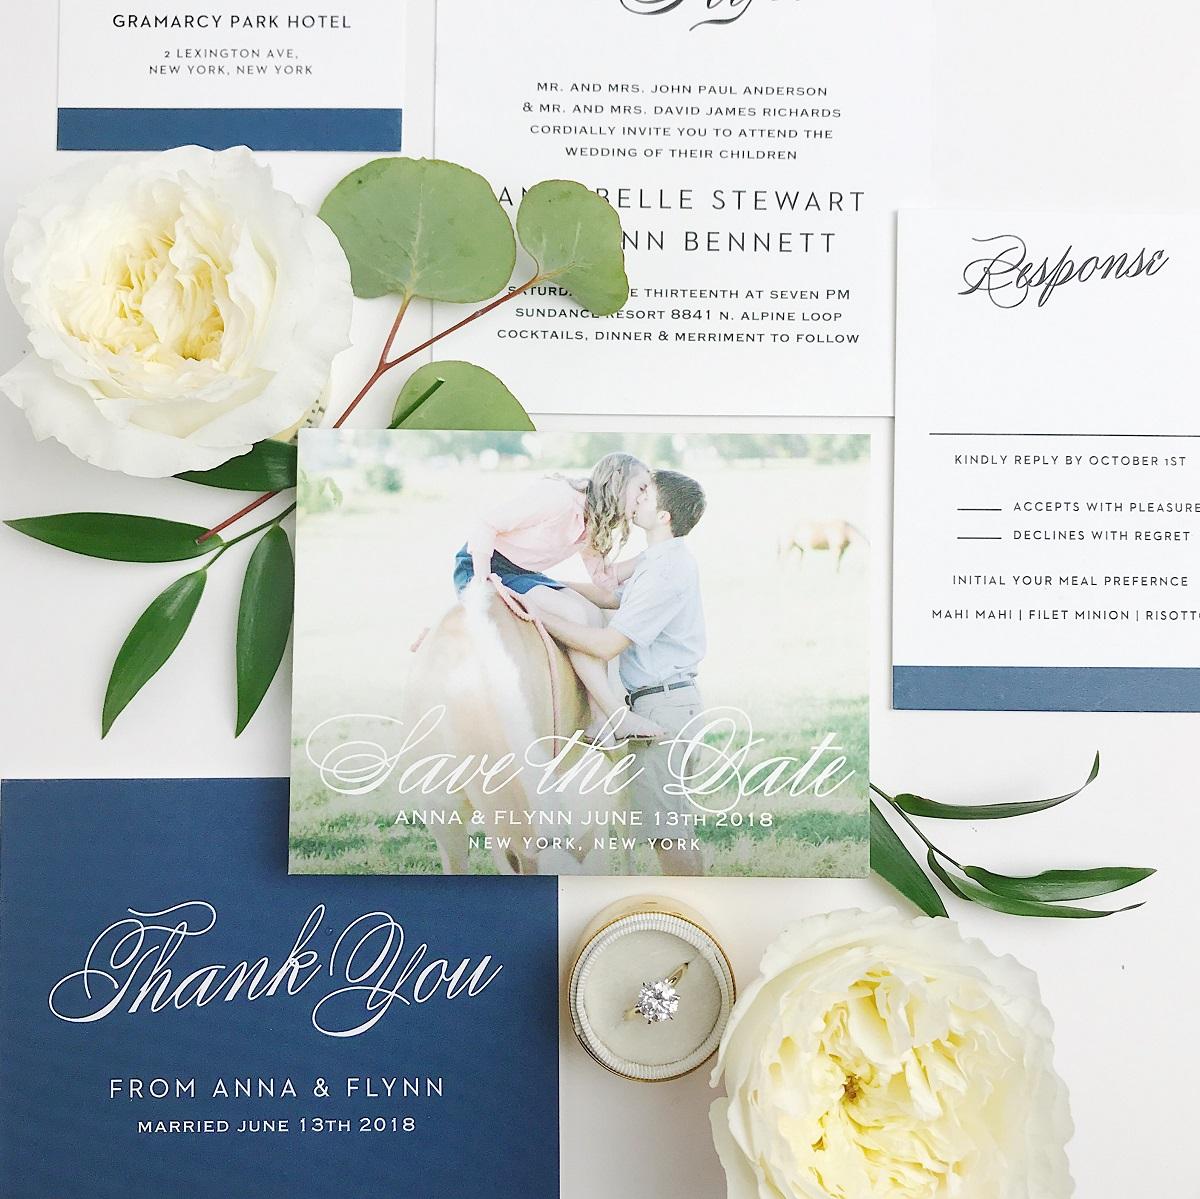 basic invite custom wedding invitations let s play oc